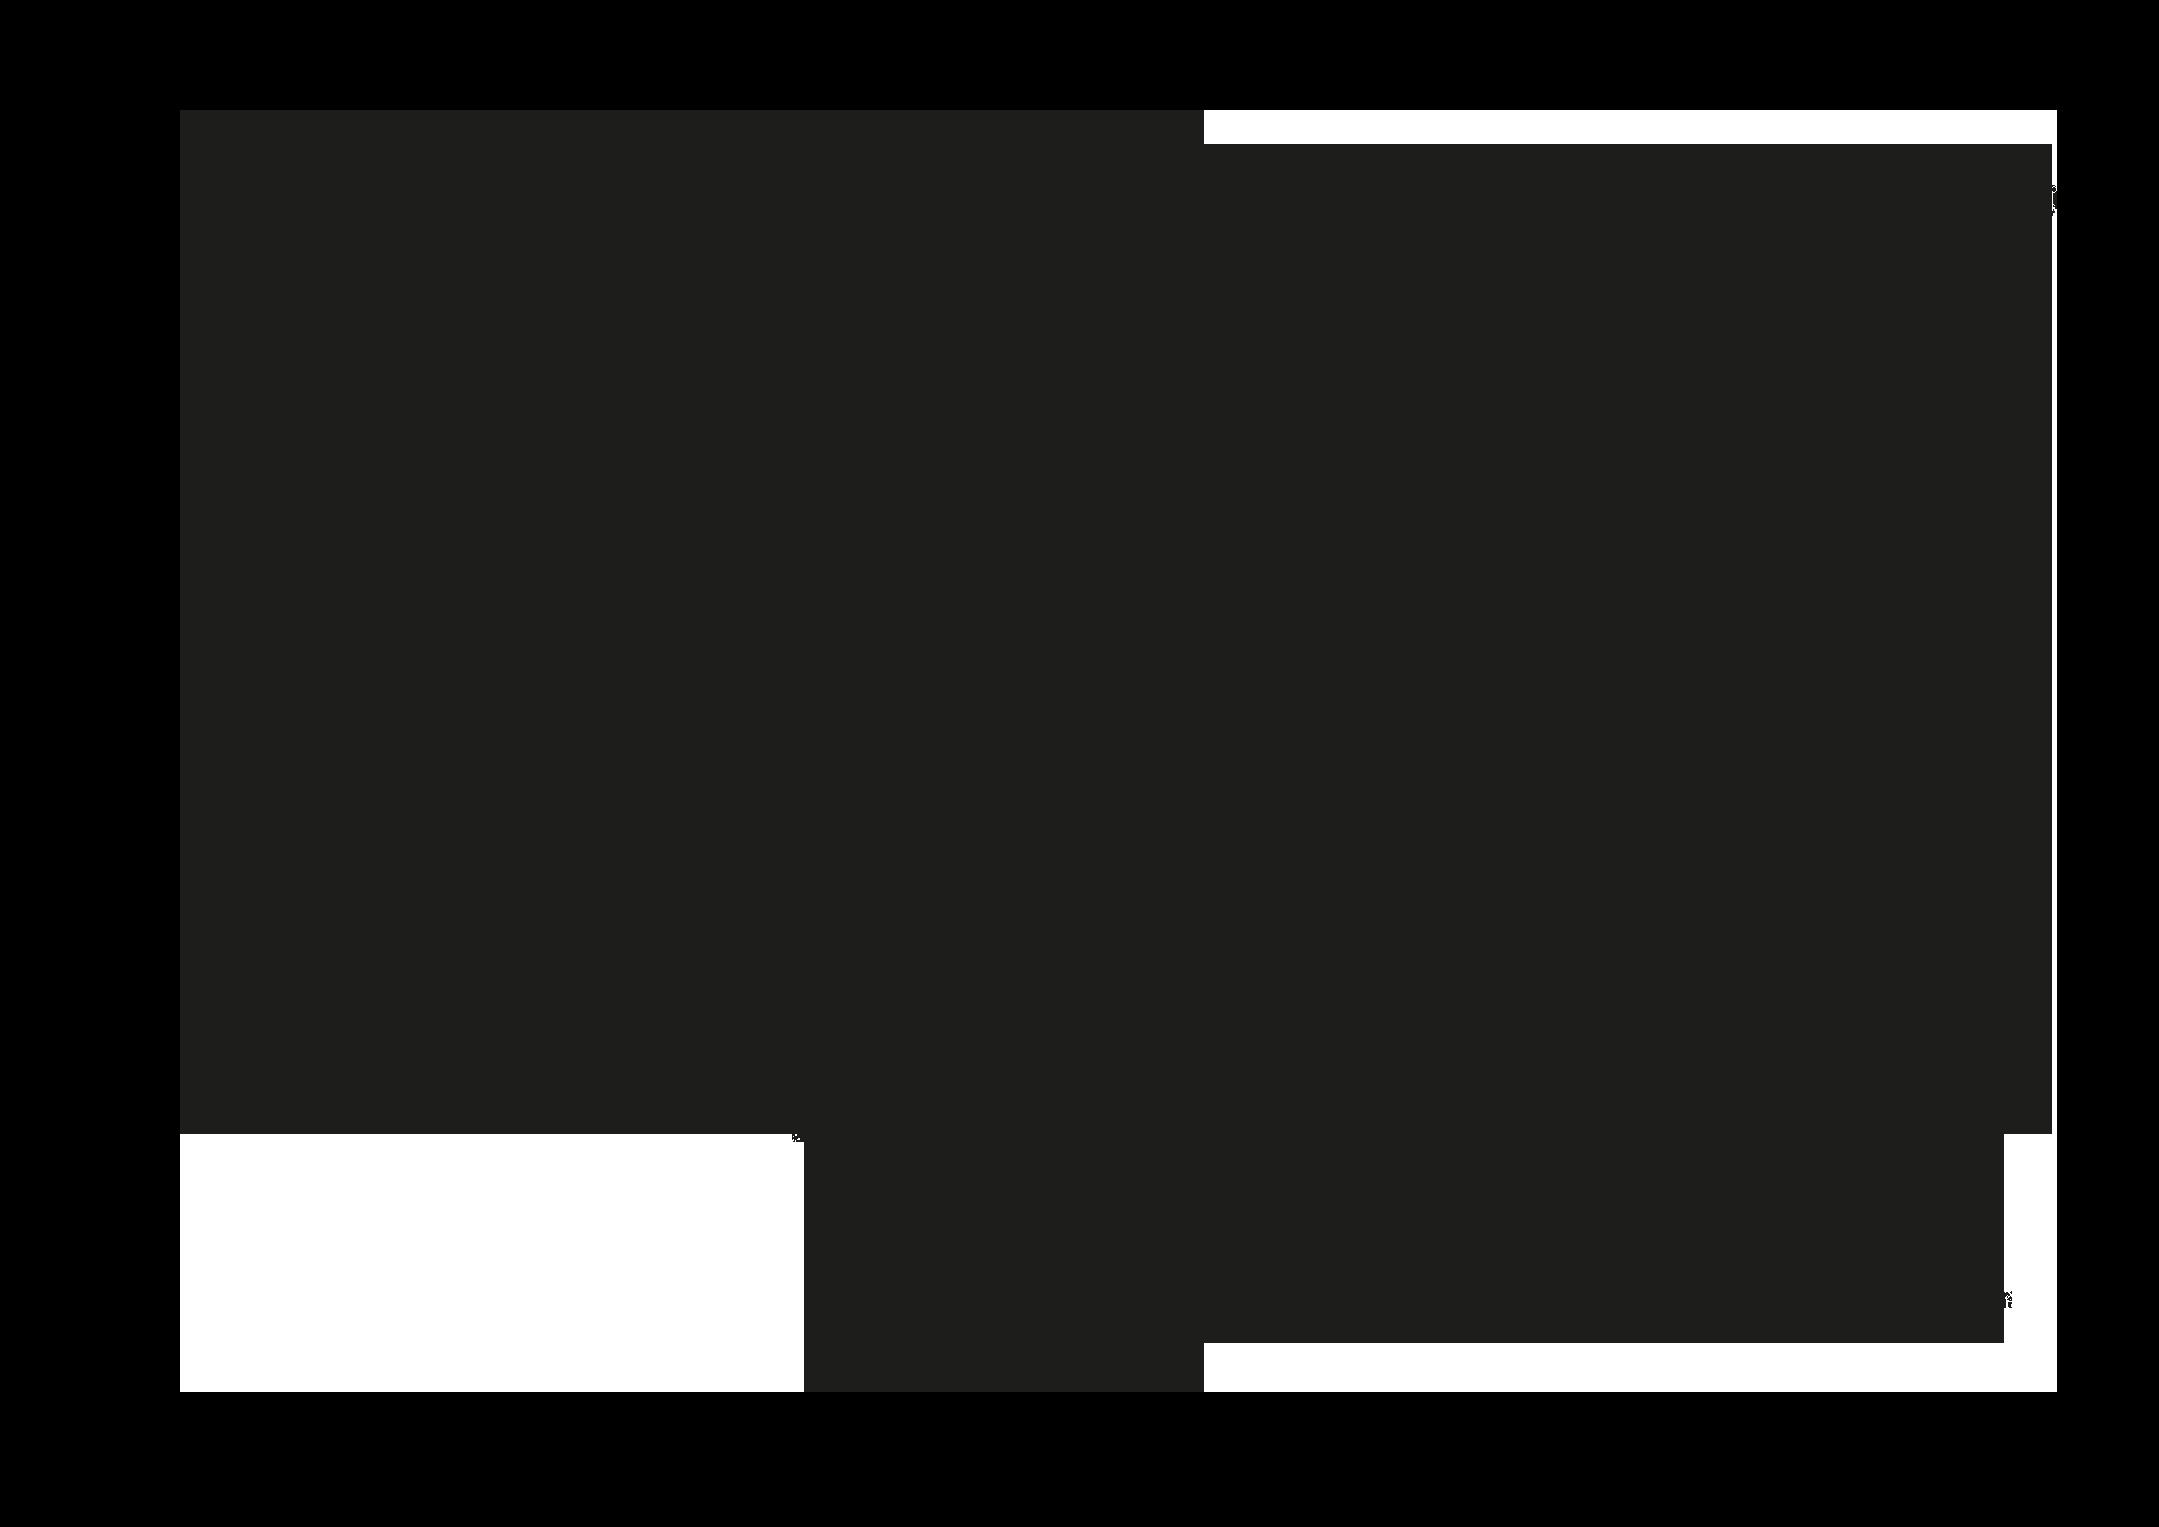 texte_ColombeNoire